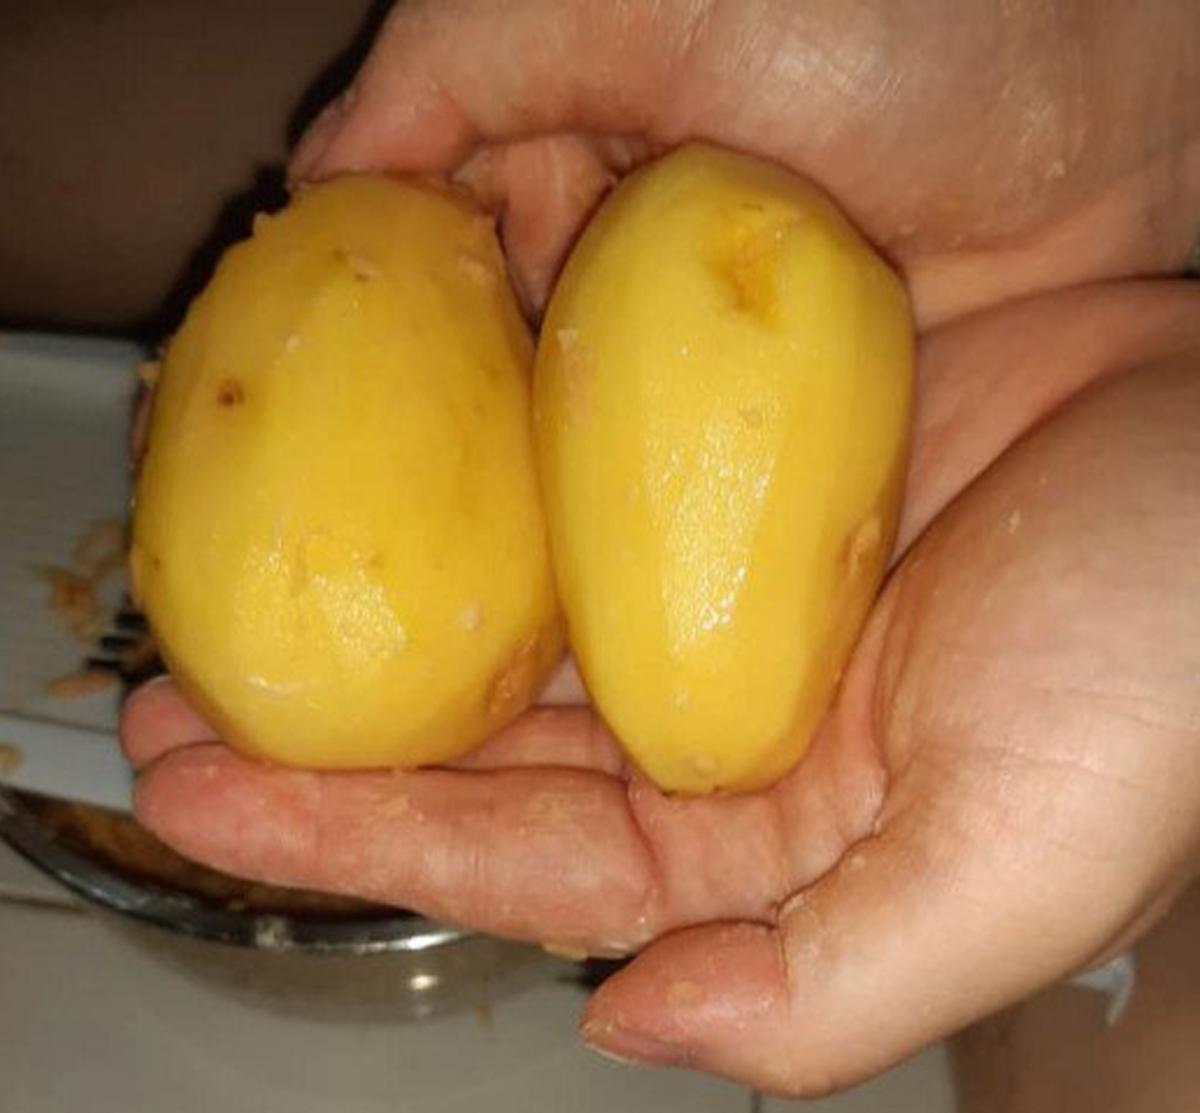 Peeled and washed Bintje potatoes ready for the mandolin